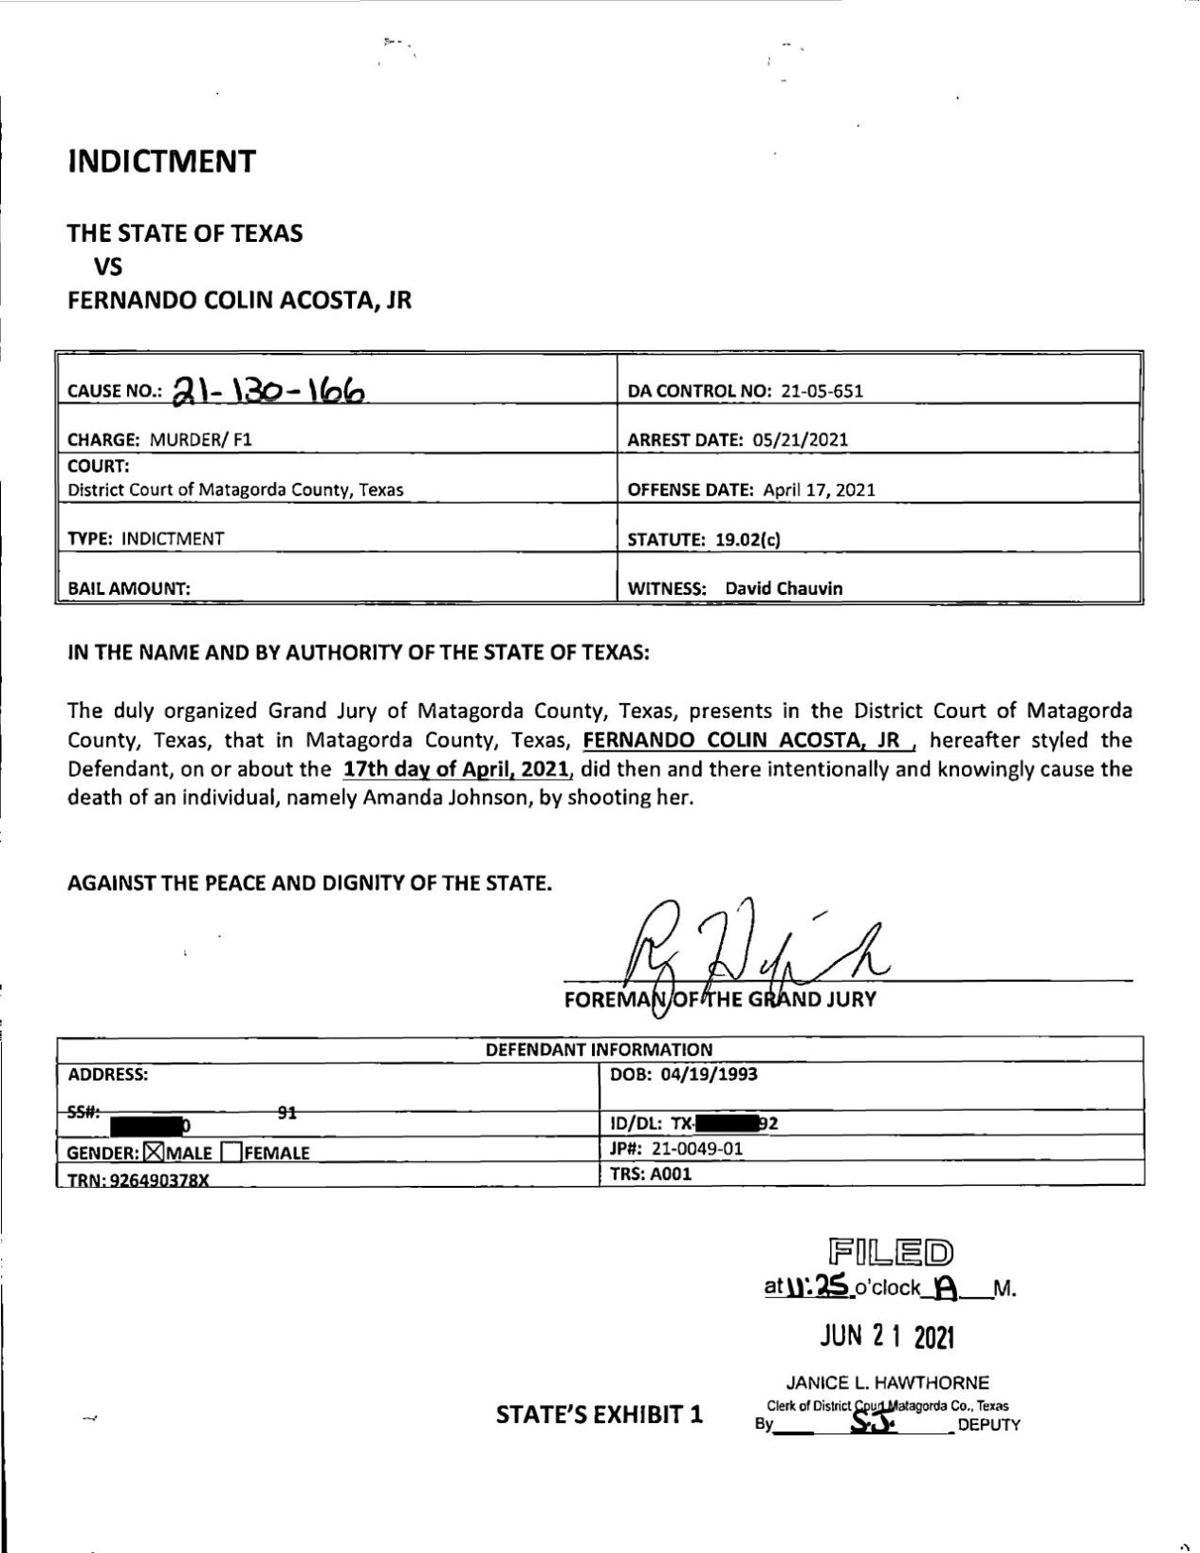 Fernando Acosta Indictment